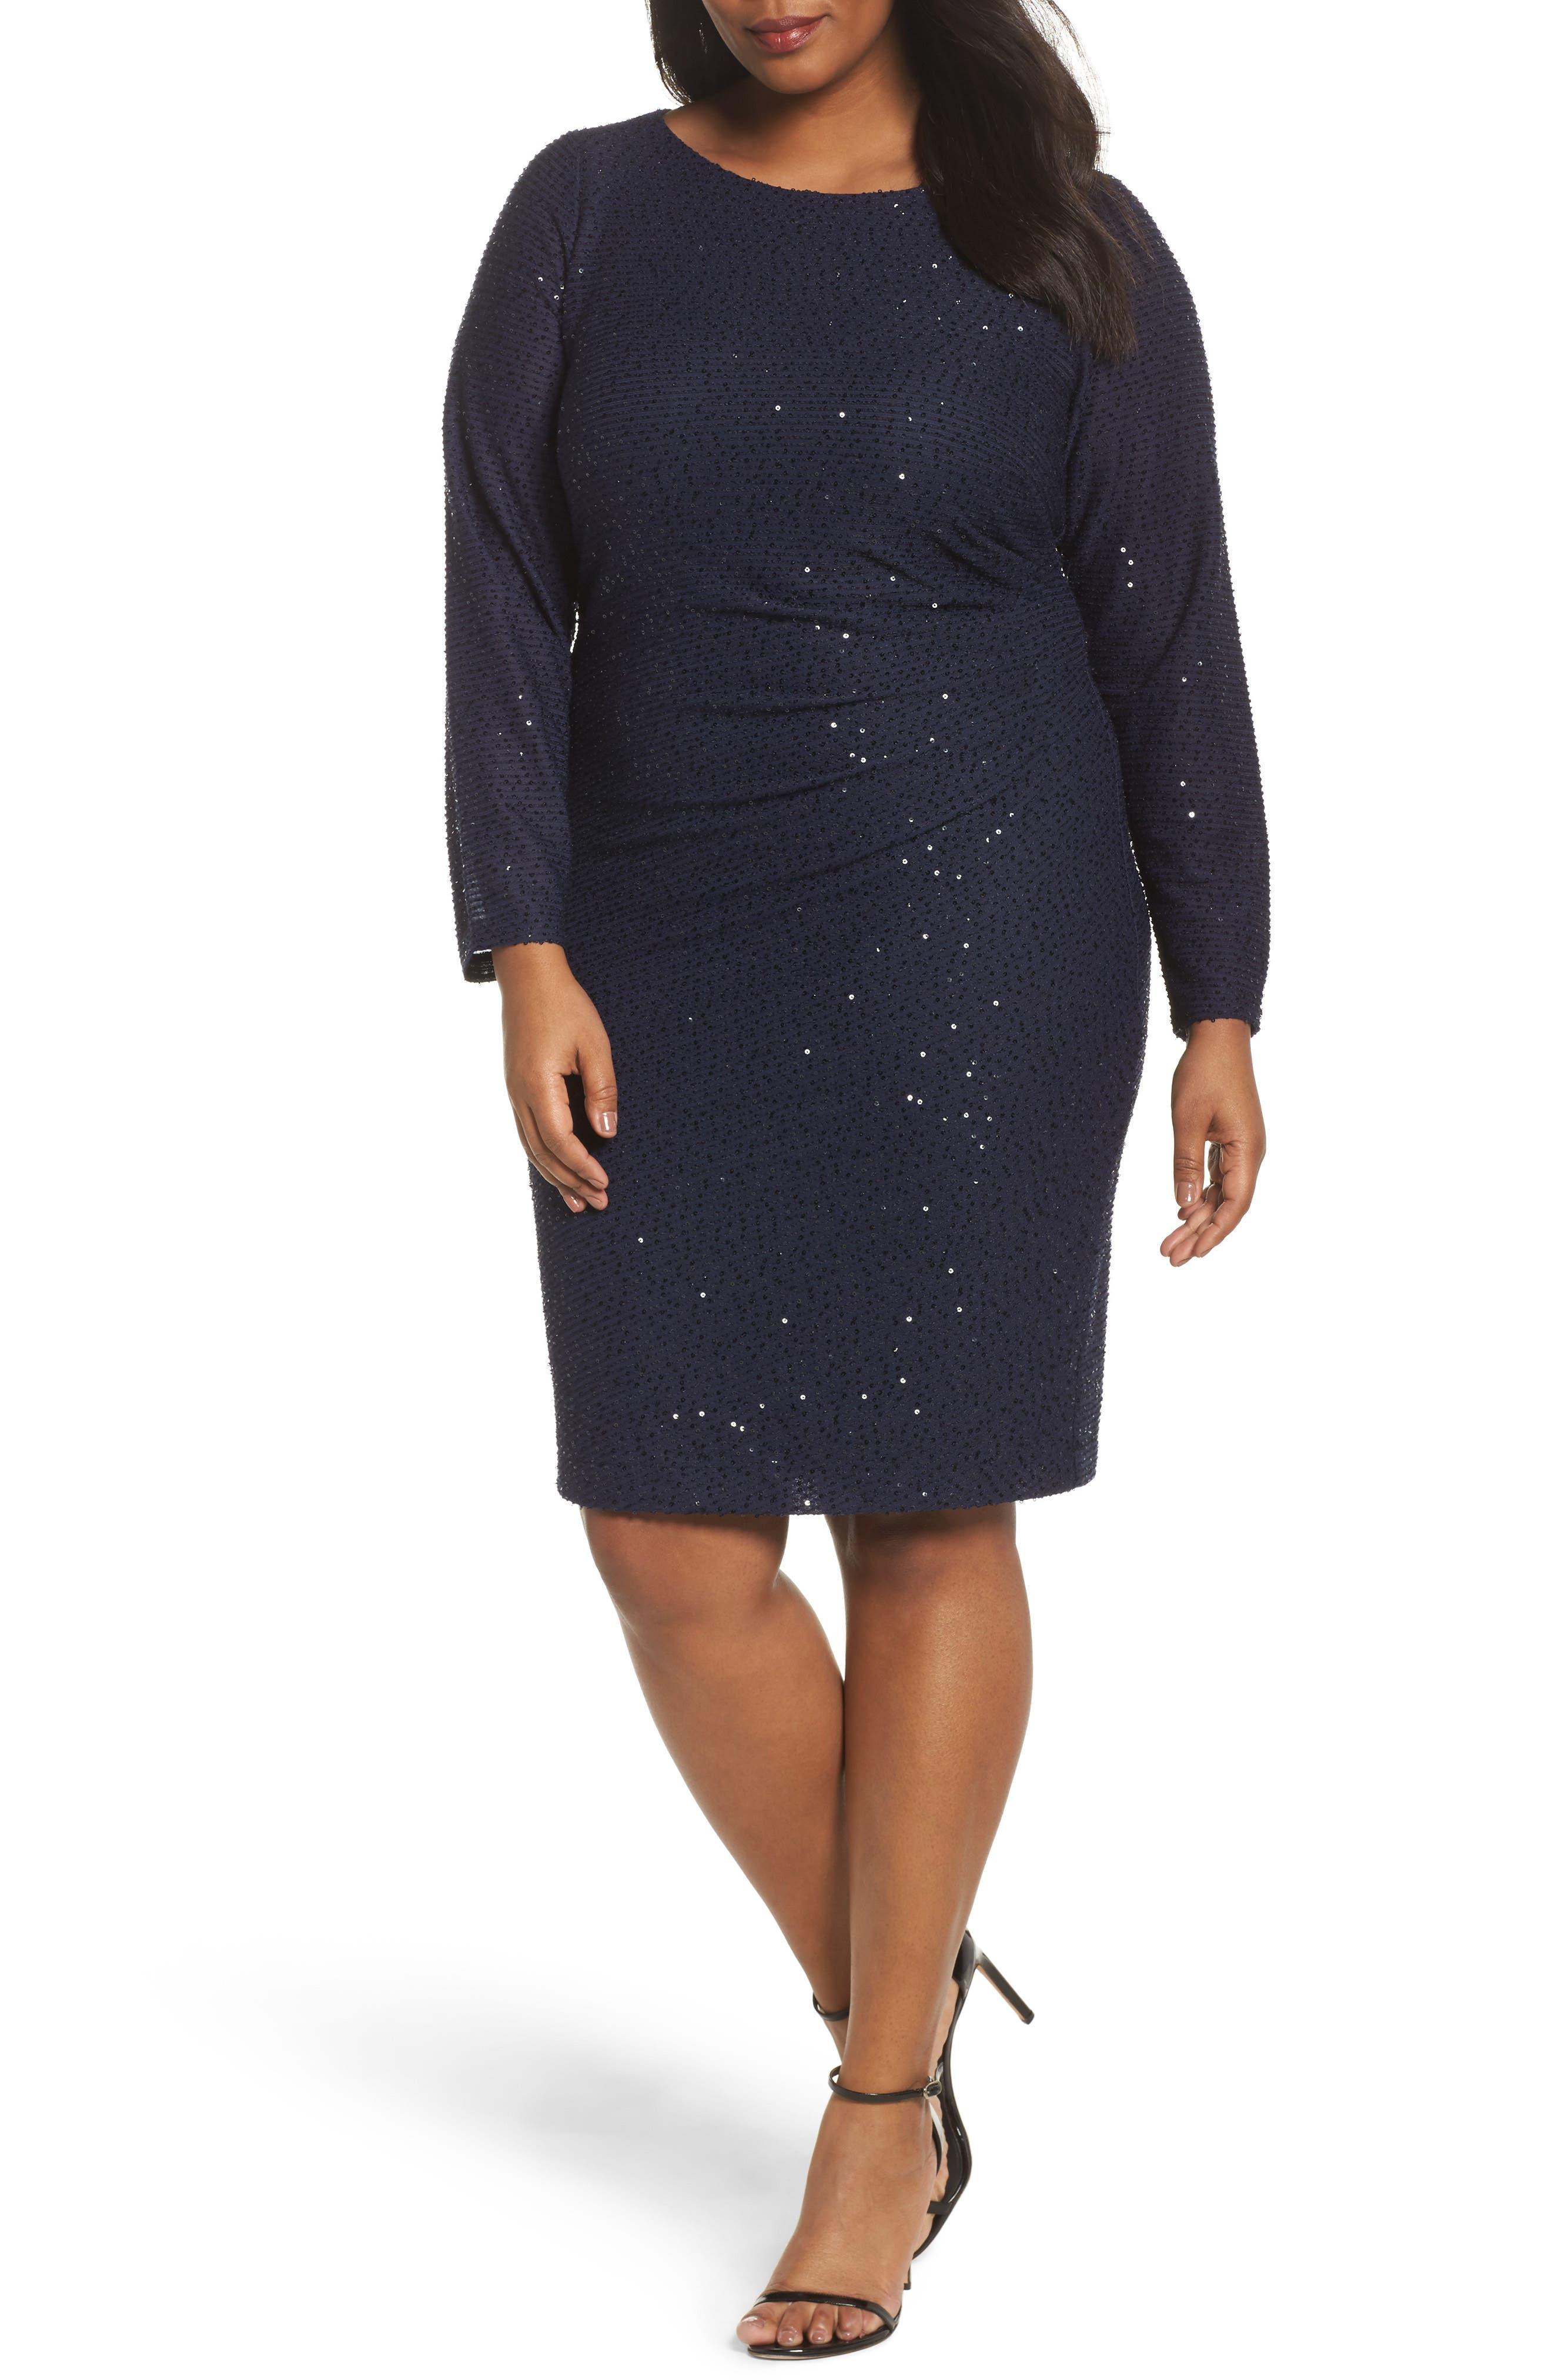 Main Image - Vince Camuto Sequin Knit Long Sleeve Dress (Plus Size)